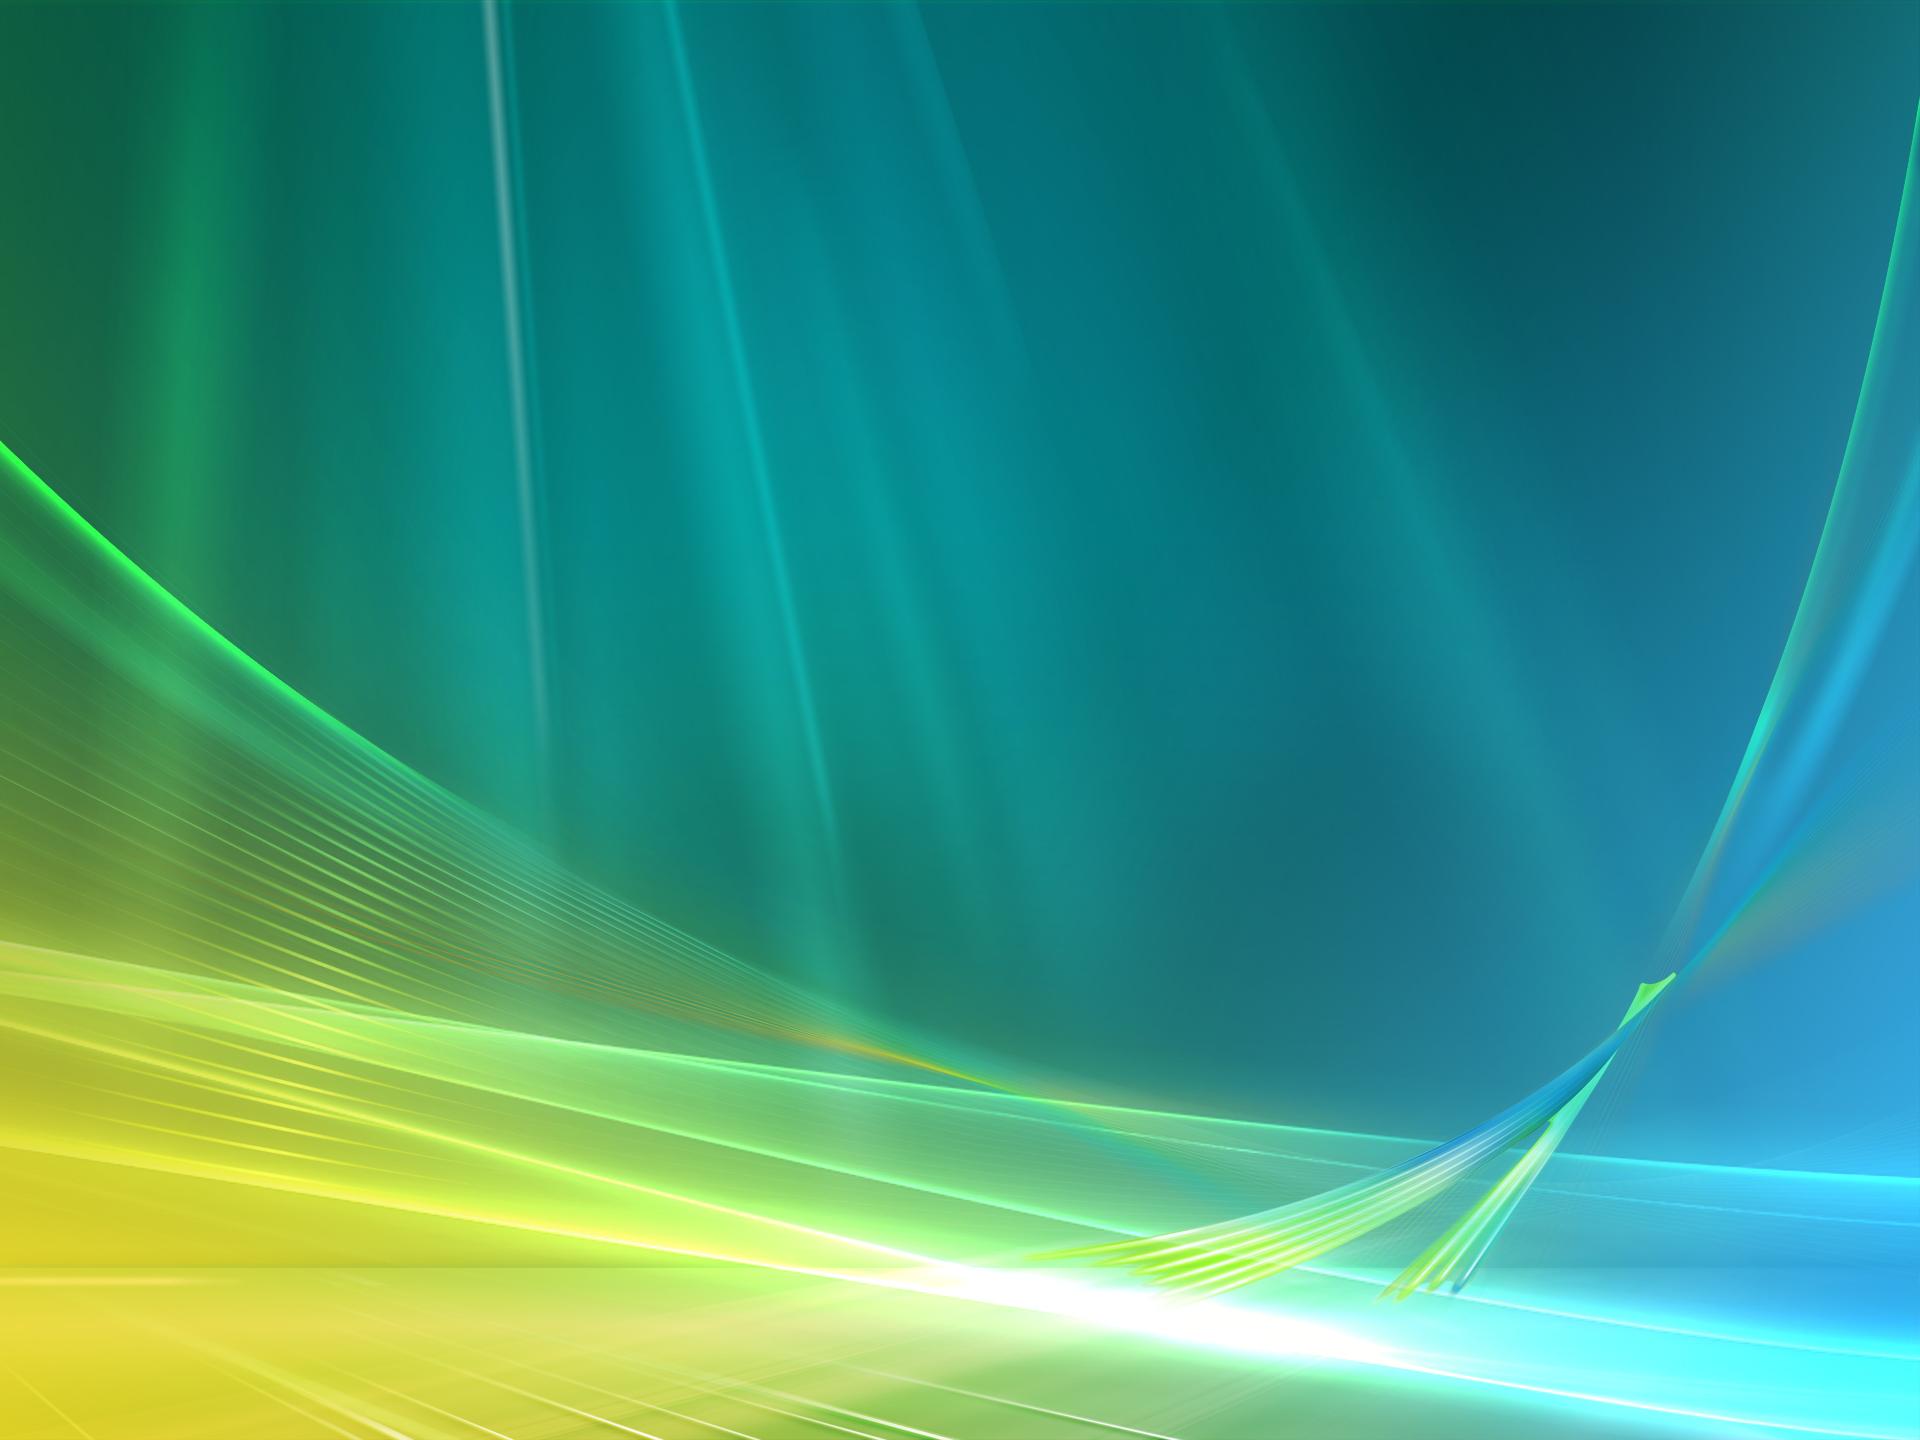 Windows Vista Default Wallpapers   OS Wallpapers 1920x1440